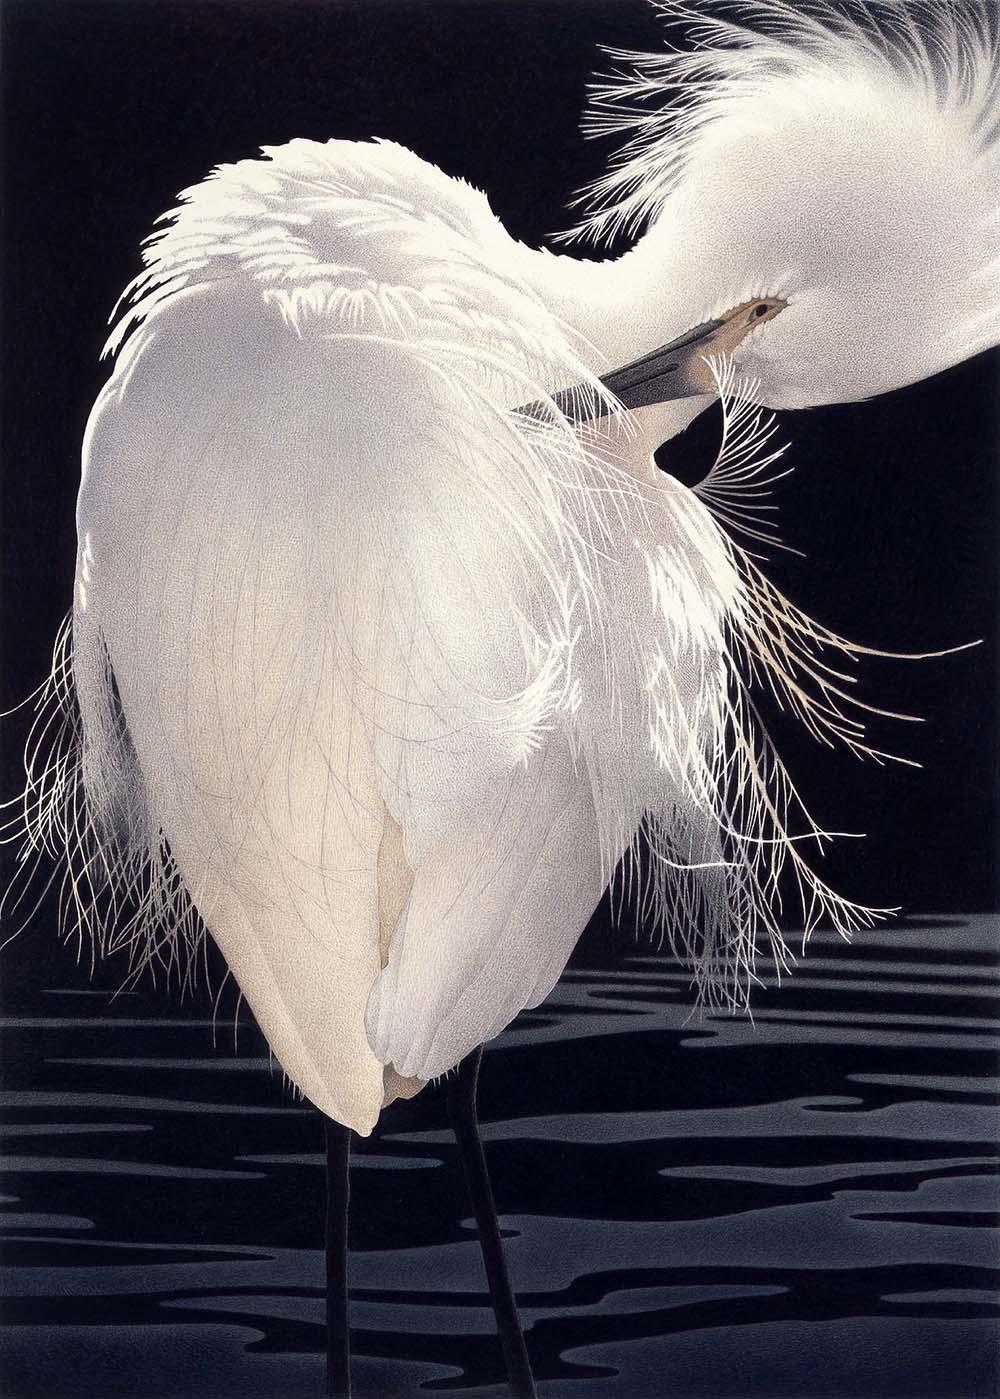 Study in White - Barbara Banthien